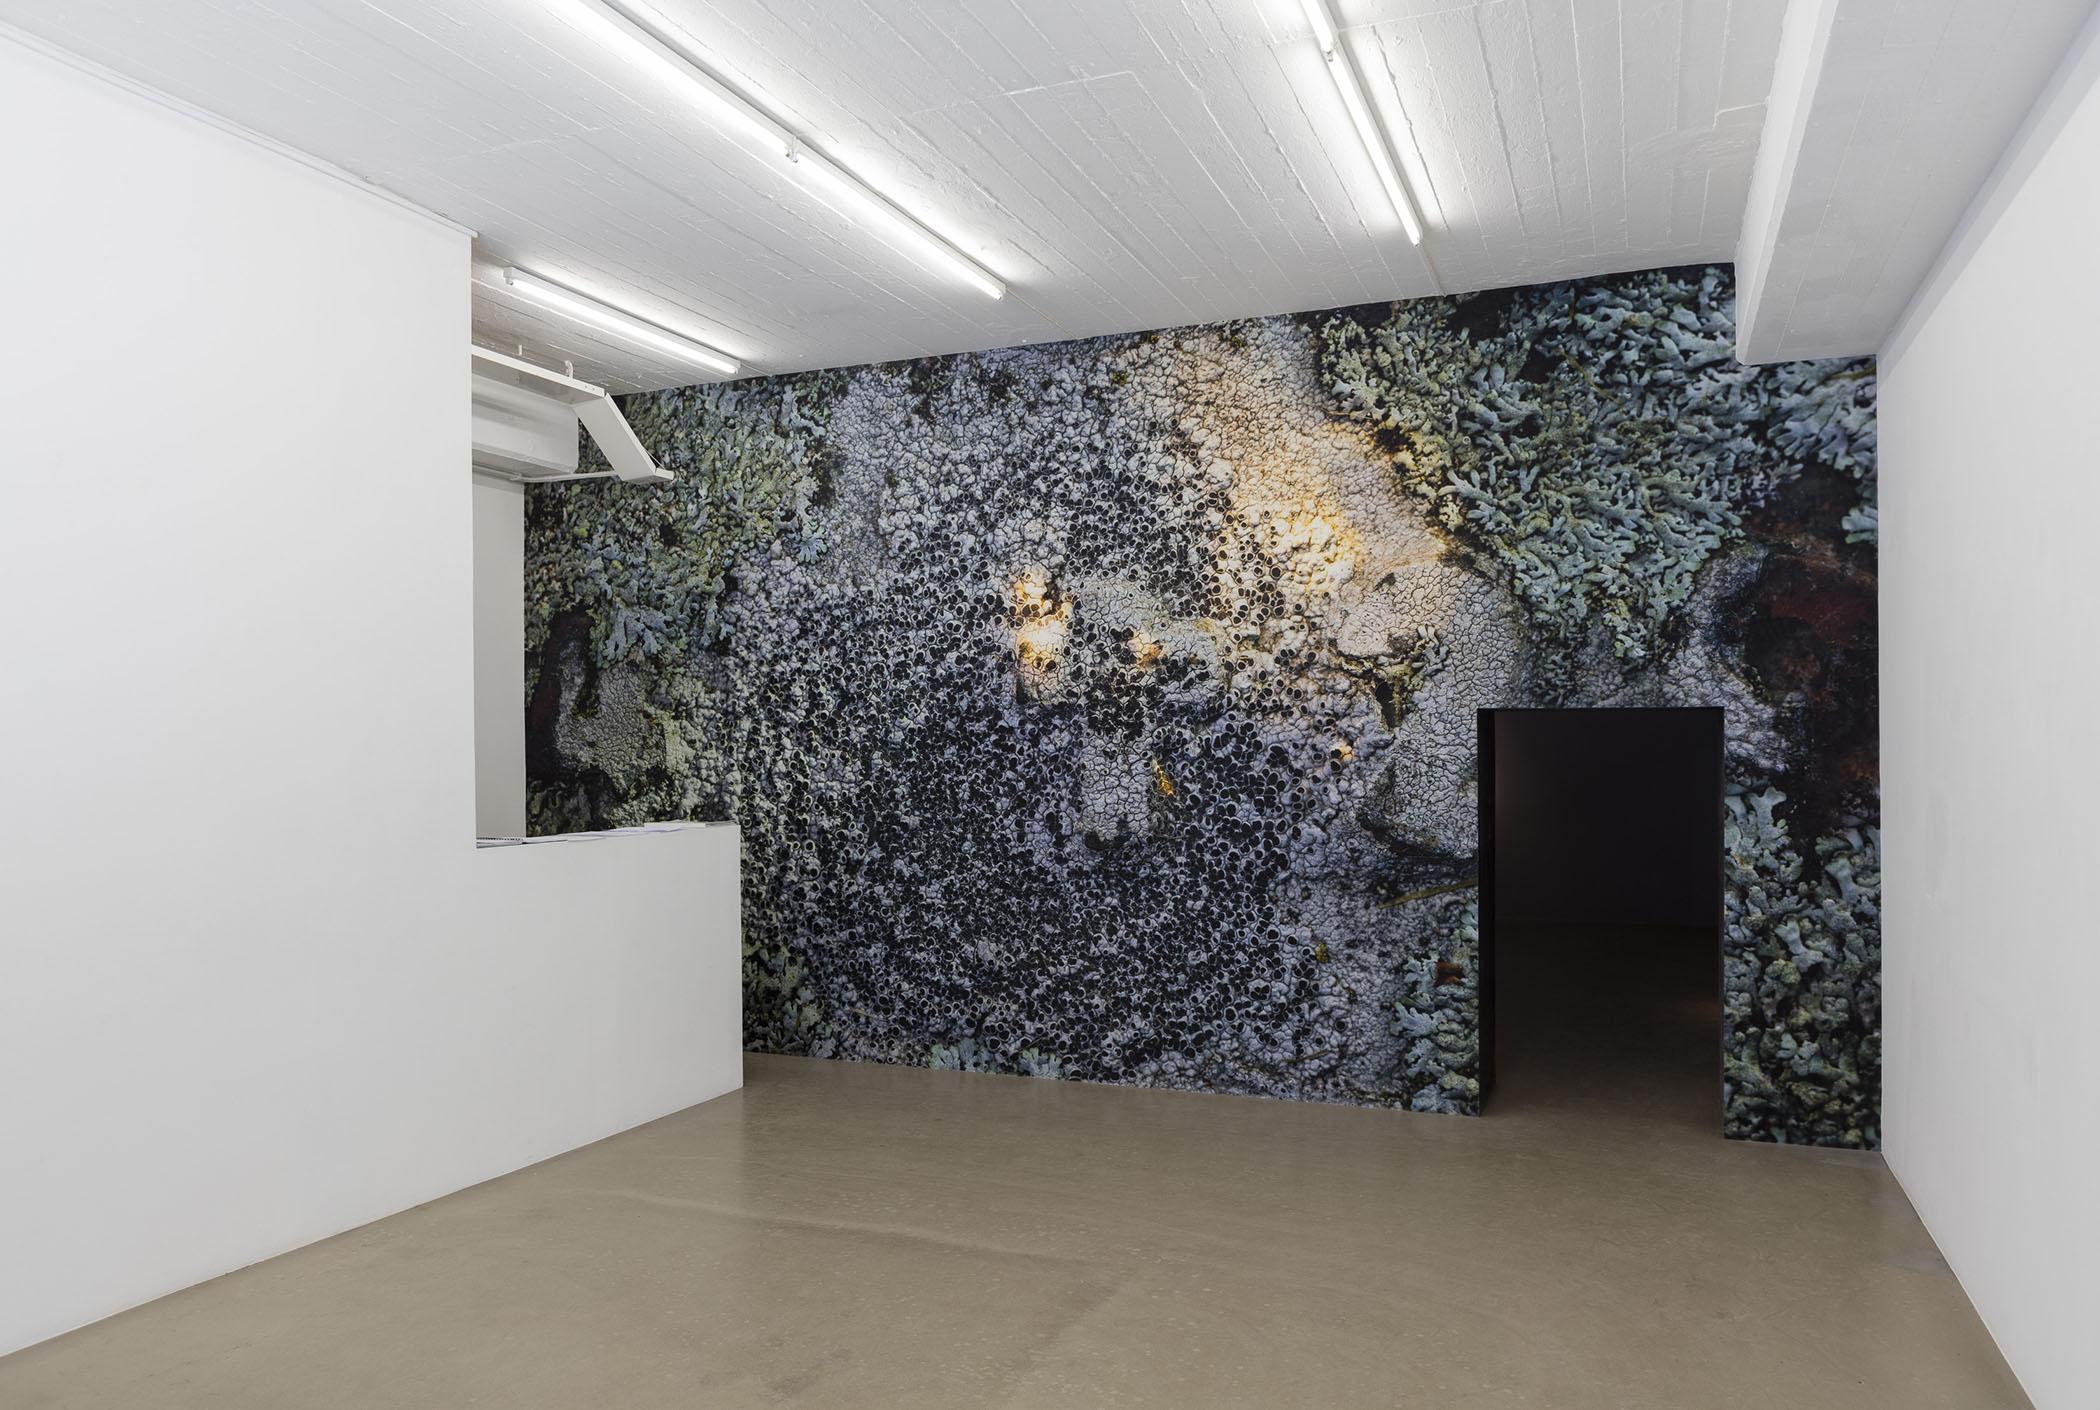 oscar-furbacken-conciliatory-gate-photo-print-on-poly-wall-330x630-cm-2017